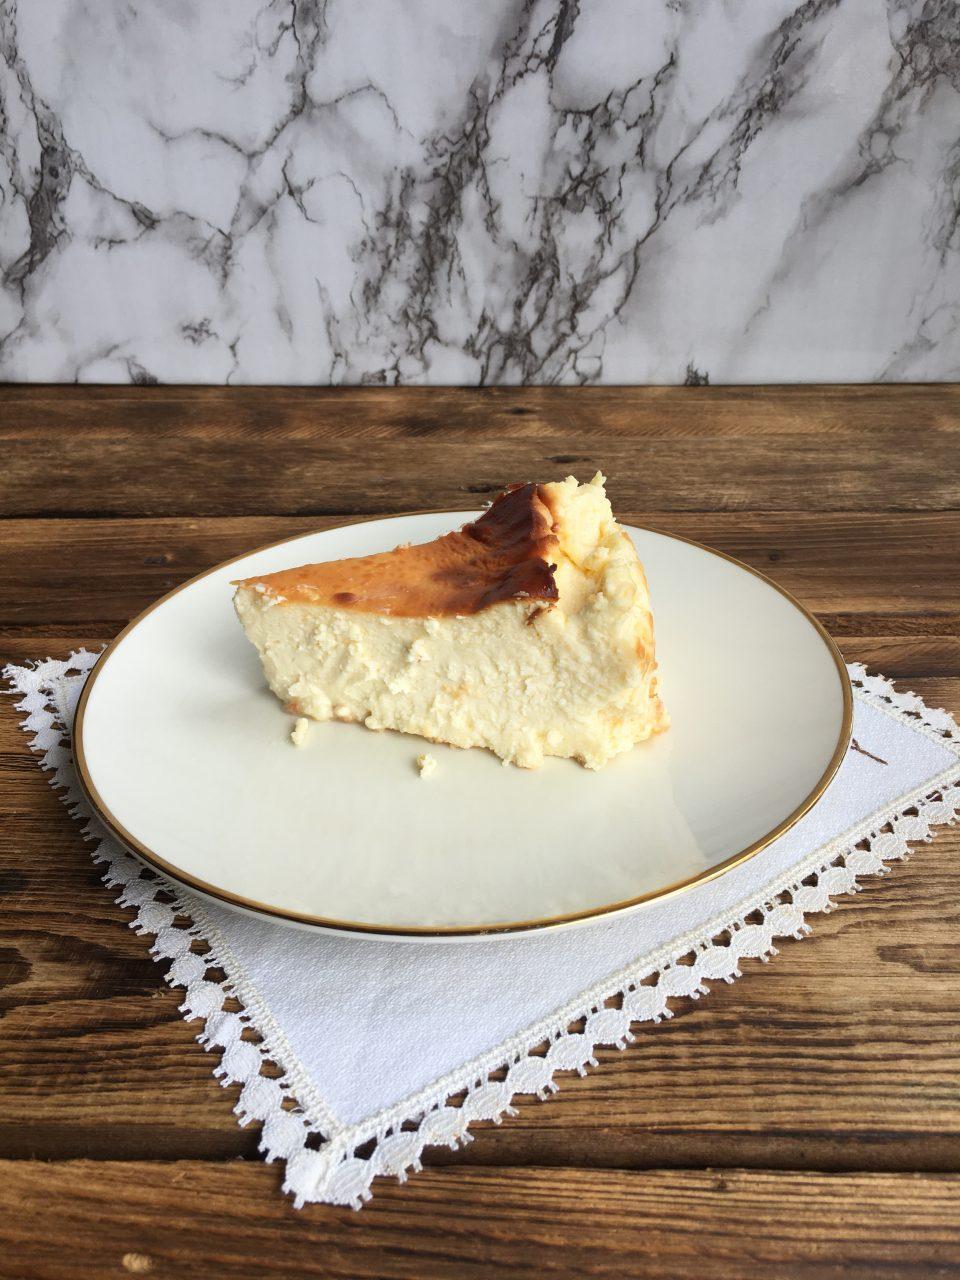 Aspecto del interior de la tarta